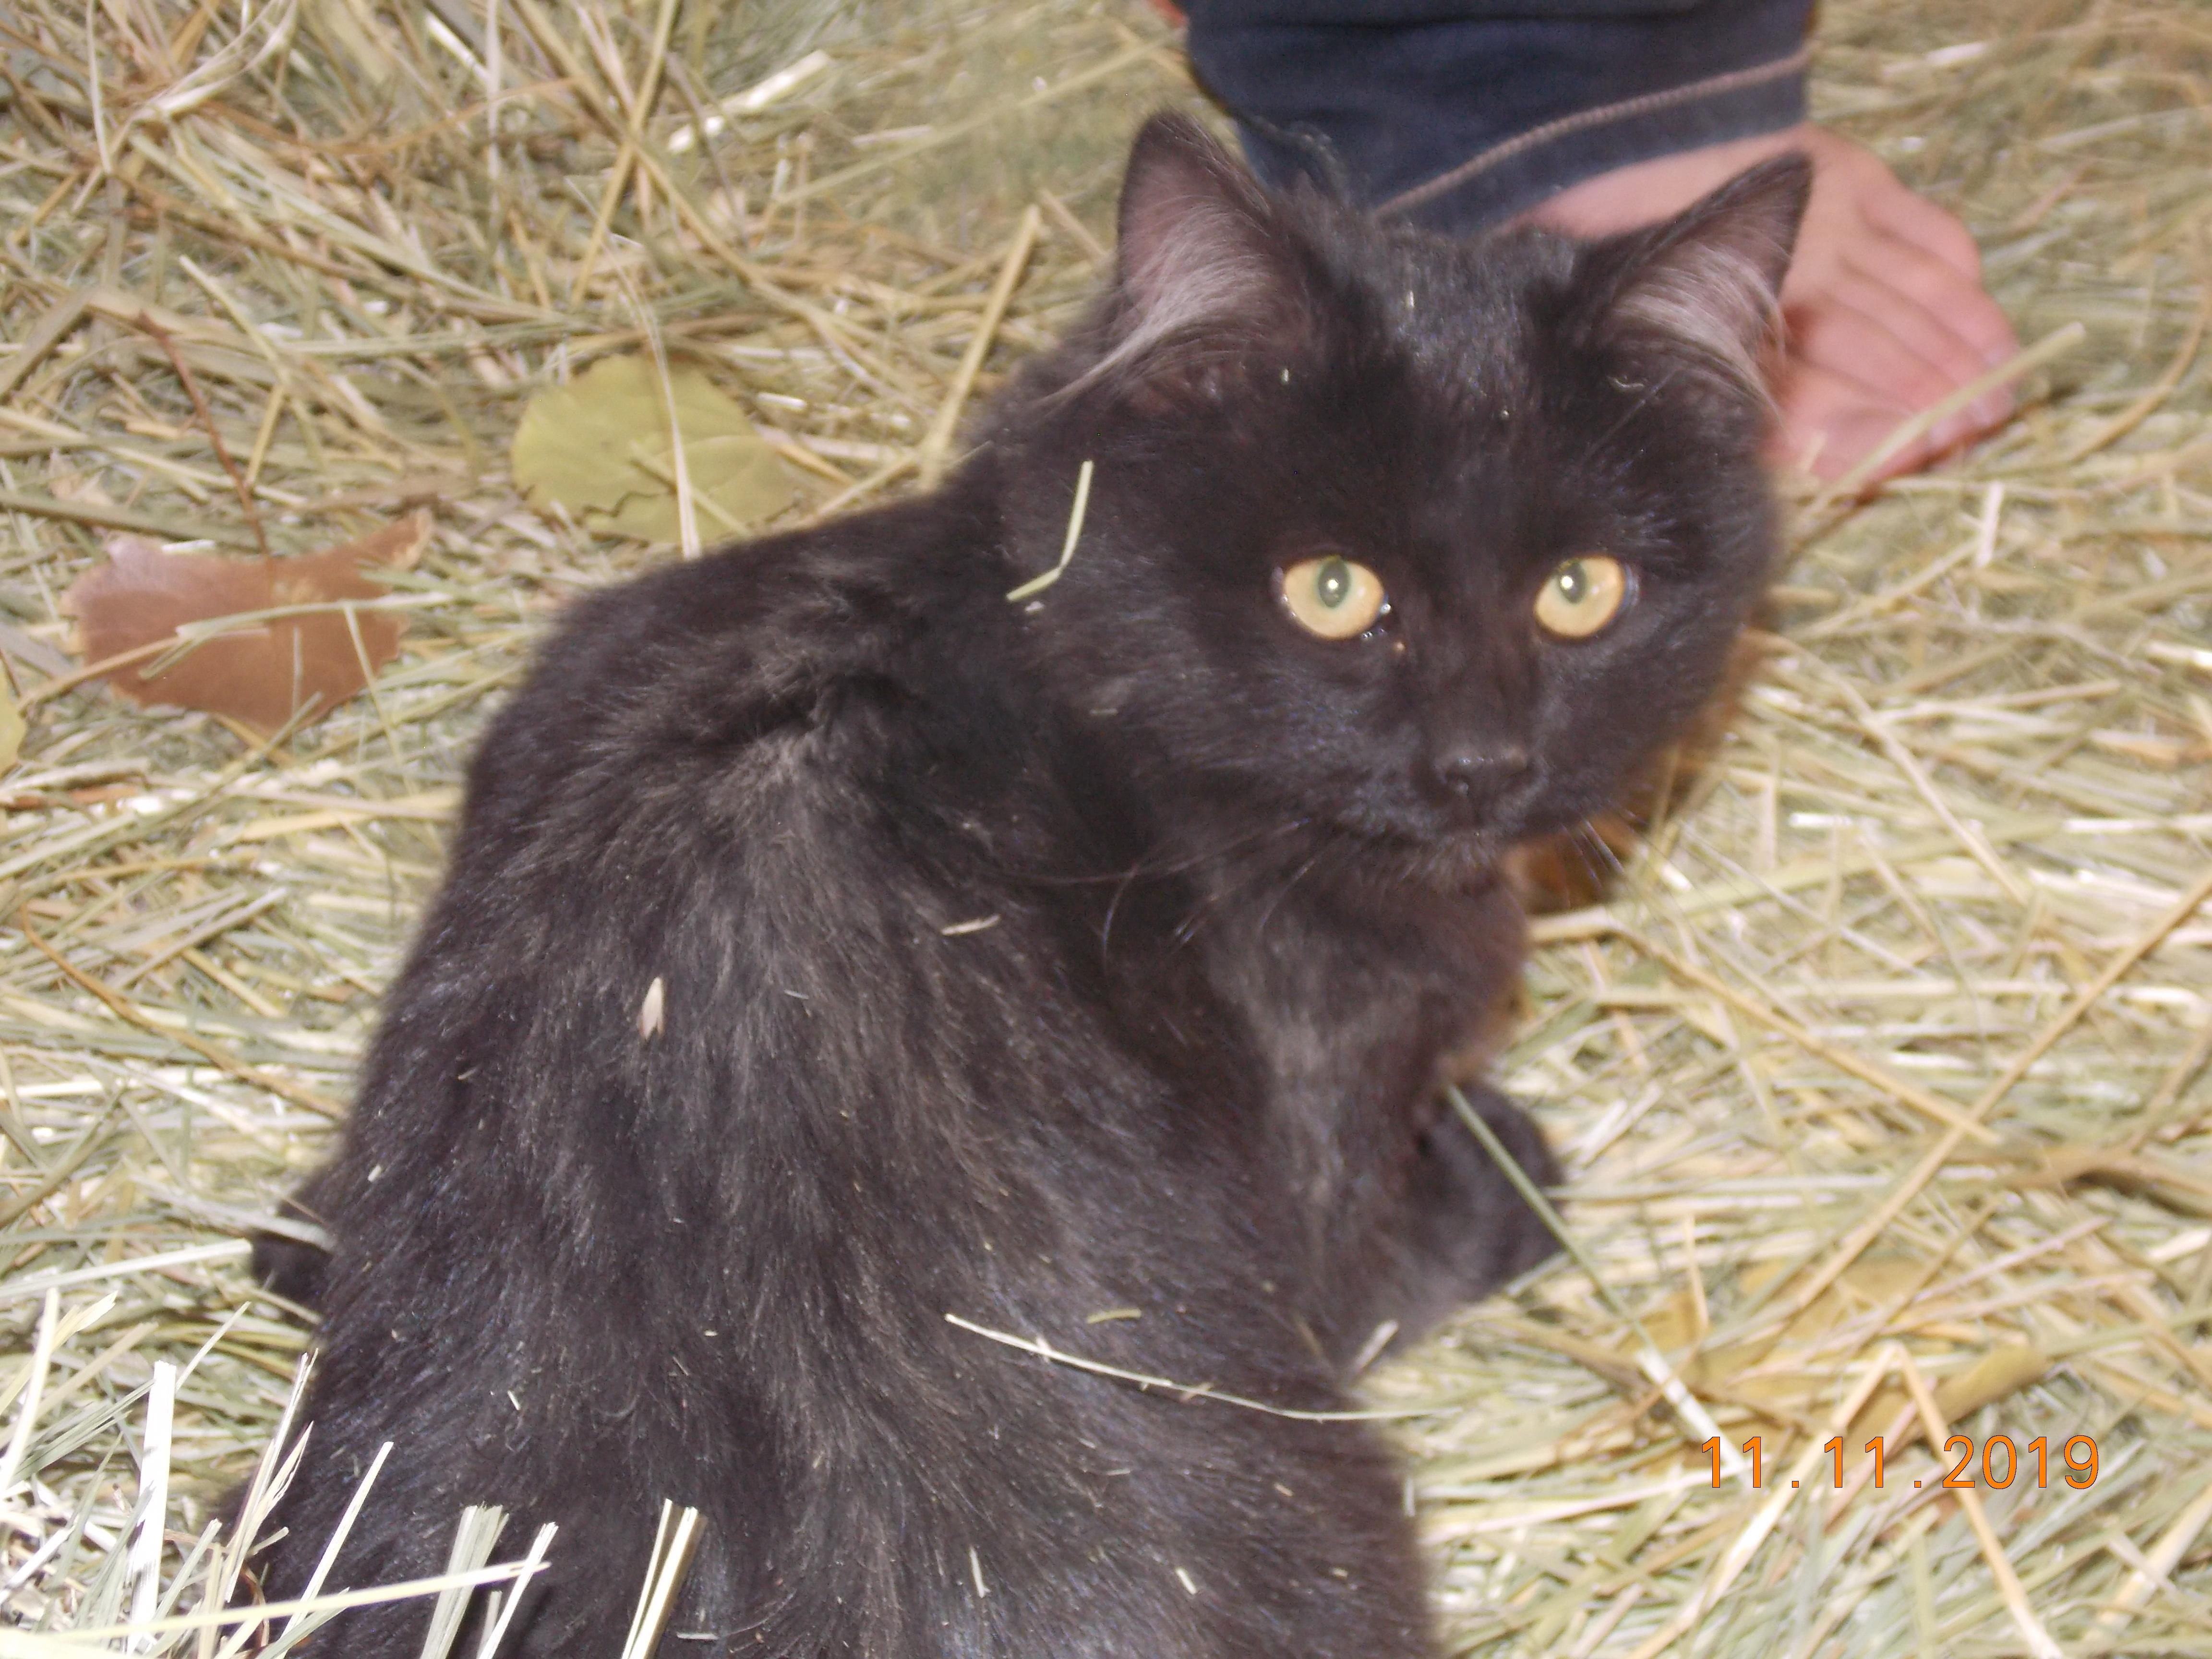 Black cat with brown eyes